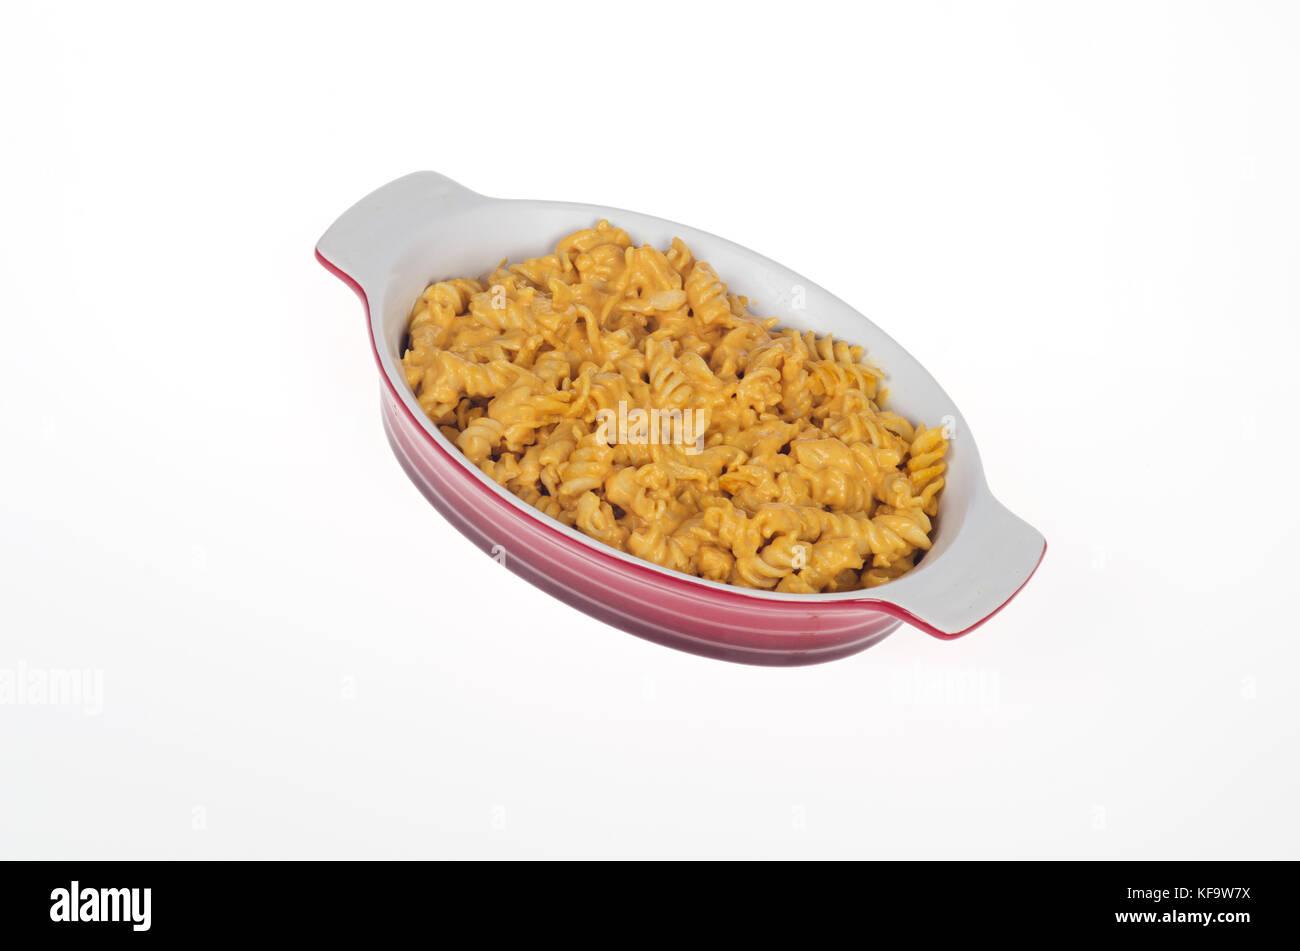 Macaroni Pasta and cheese in stoneware dish - Stock Image